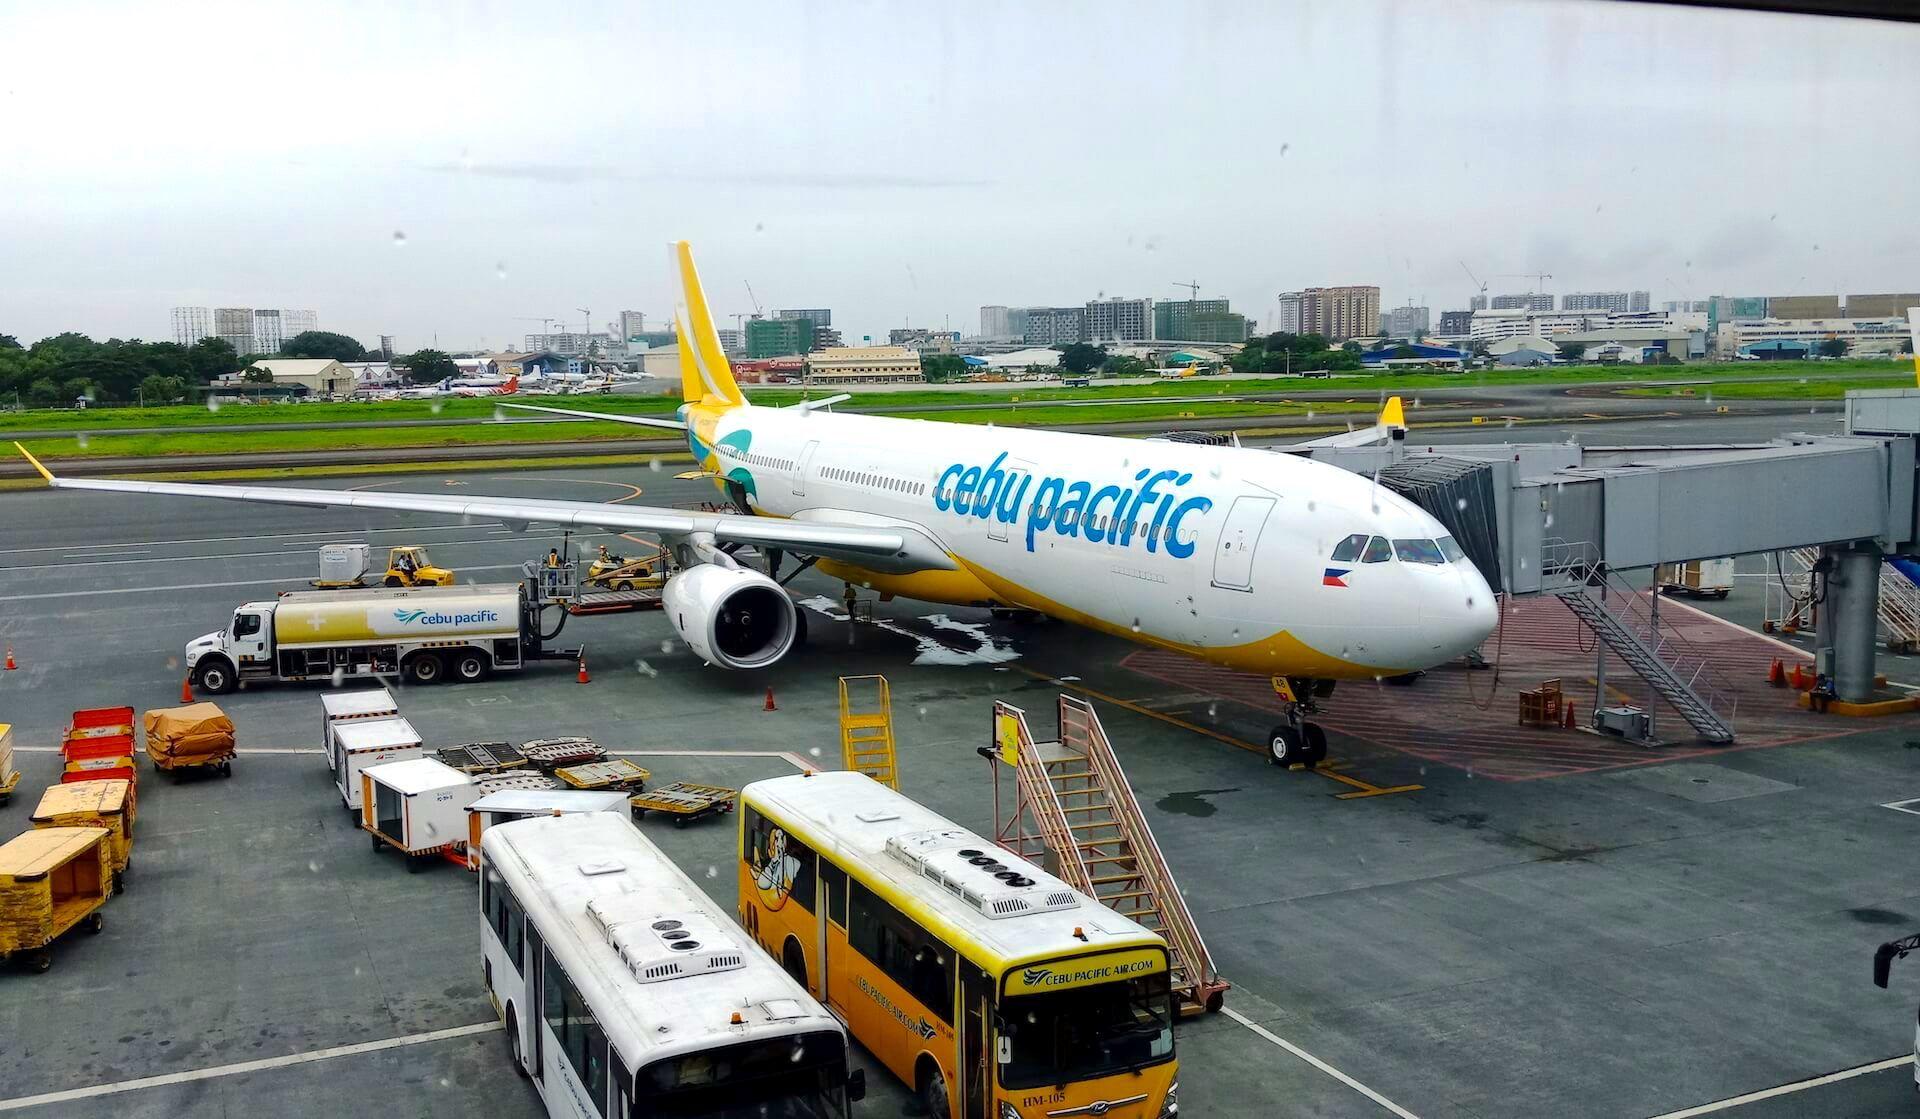 Flughafen Manila (MNL) - Cebu Pacific